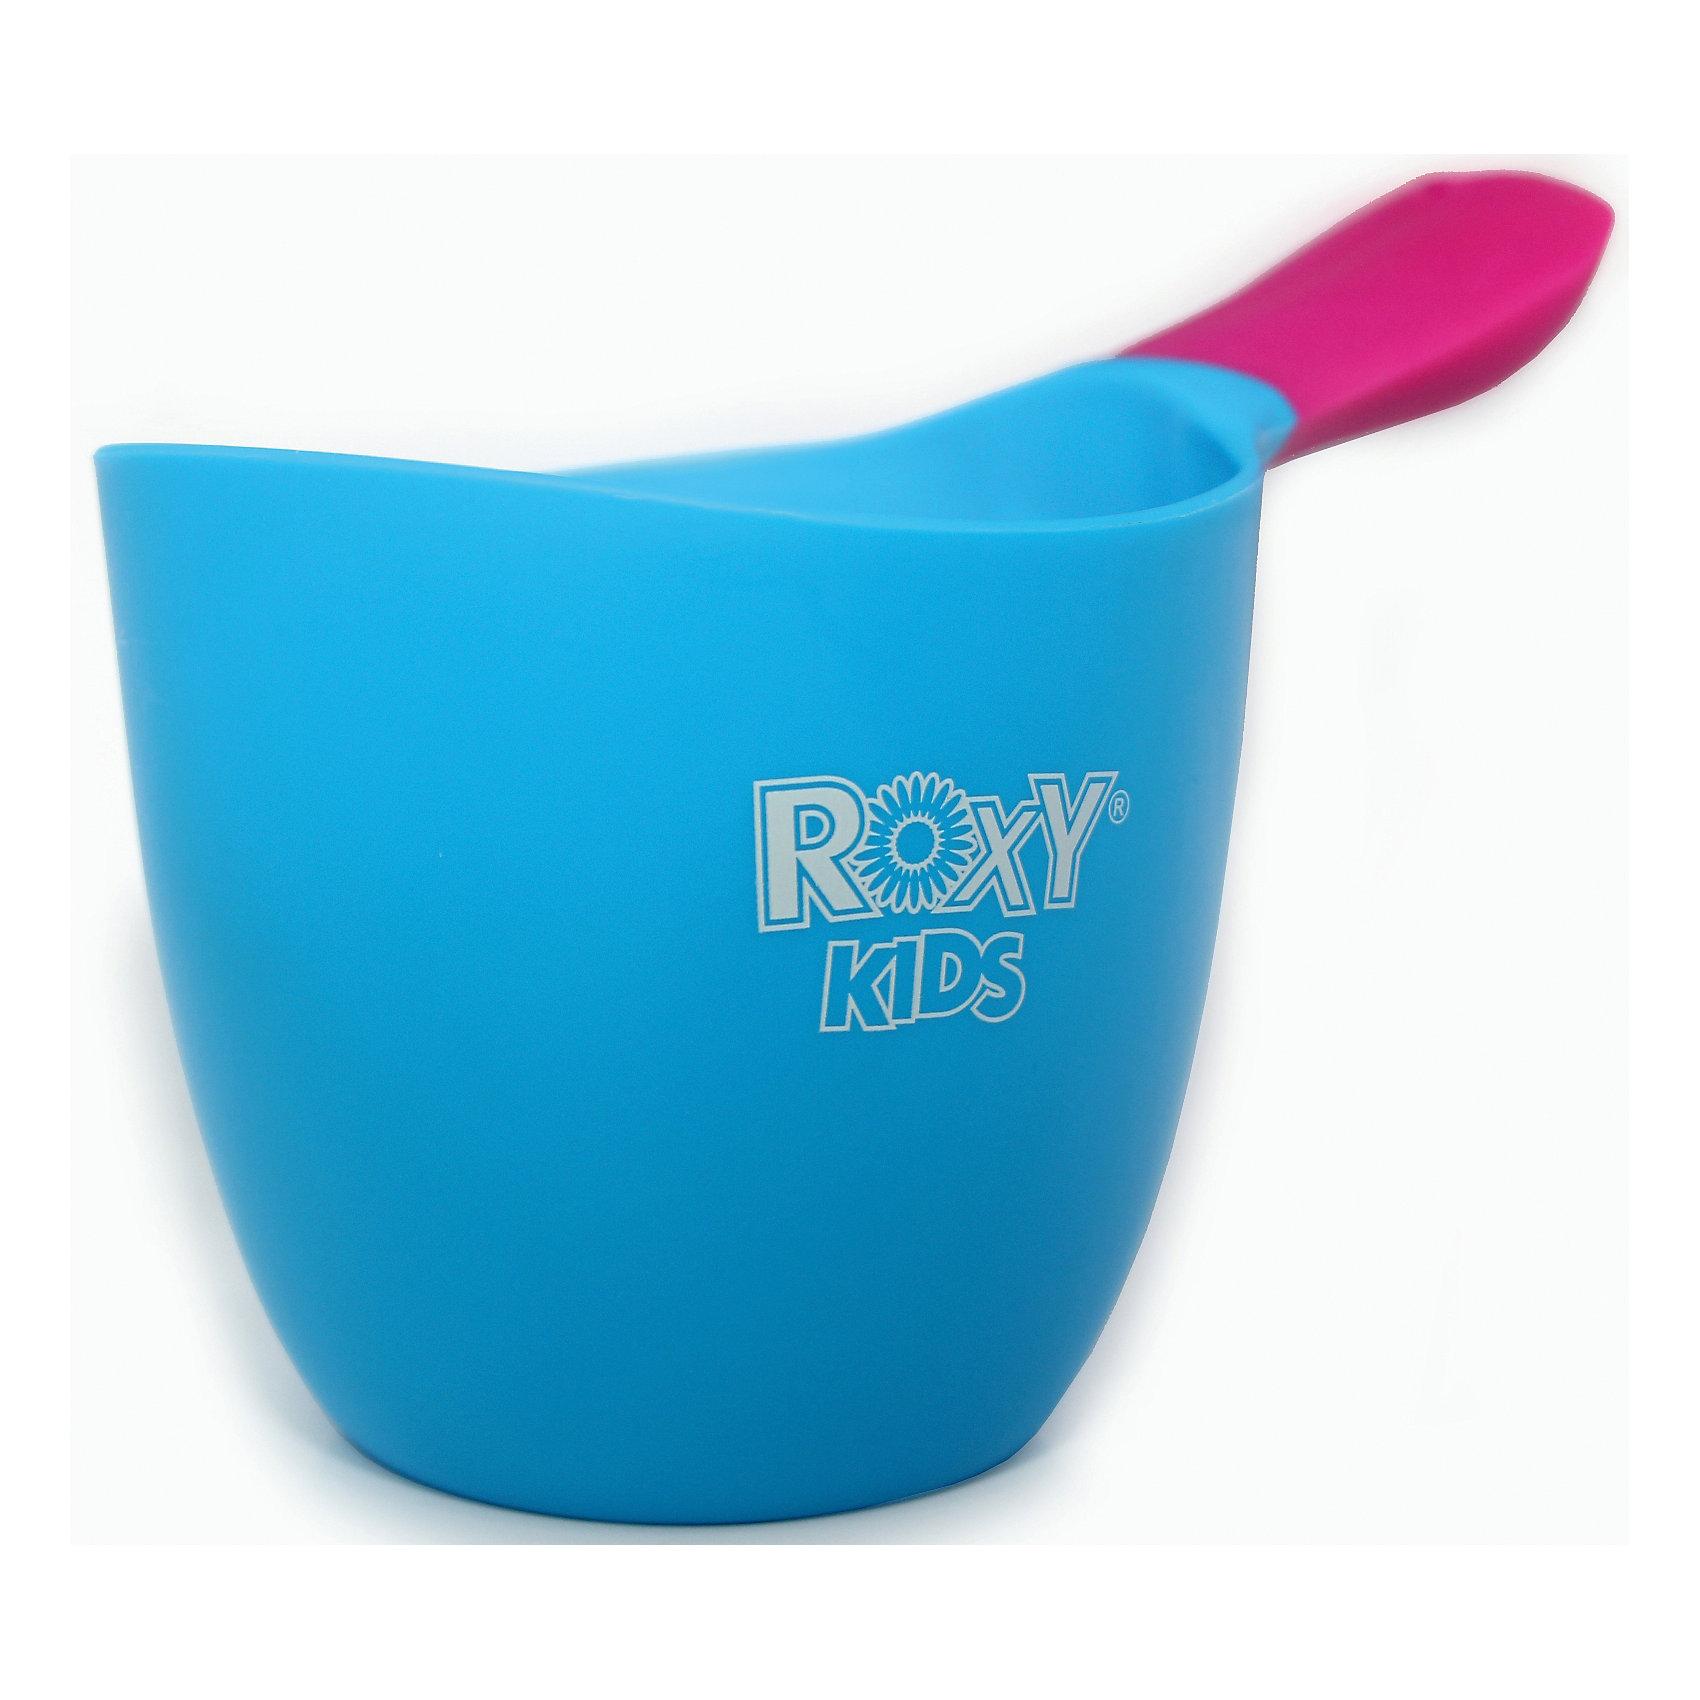 Roxy-Kids Ковшик для ванны, Roxy-kids, голубой газоотводная трубочка roxy kids для новорожденных многоразовая